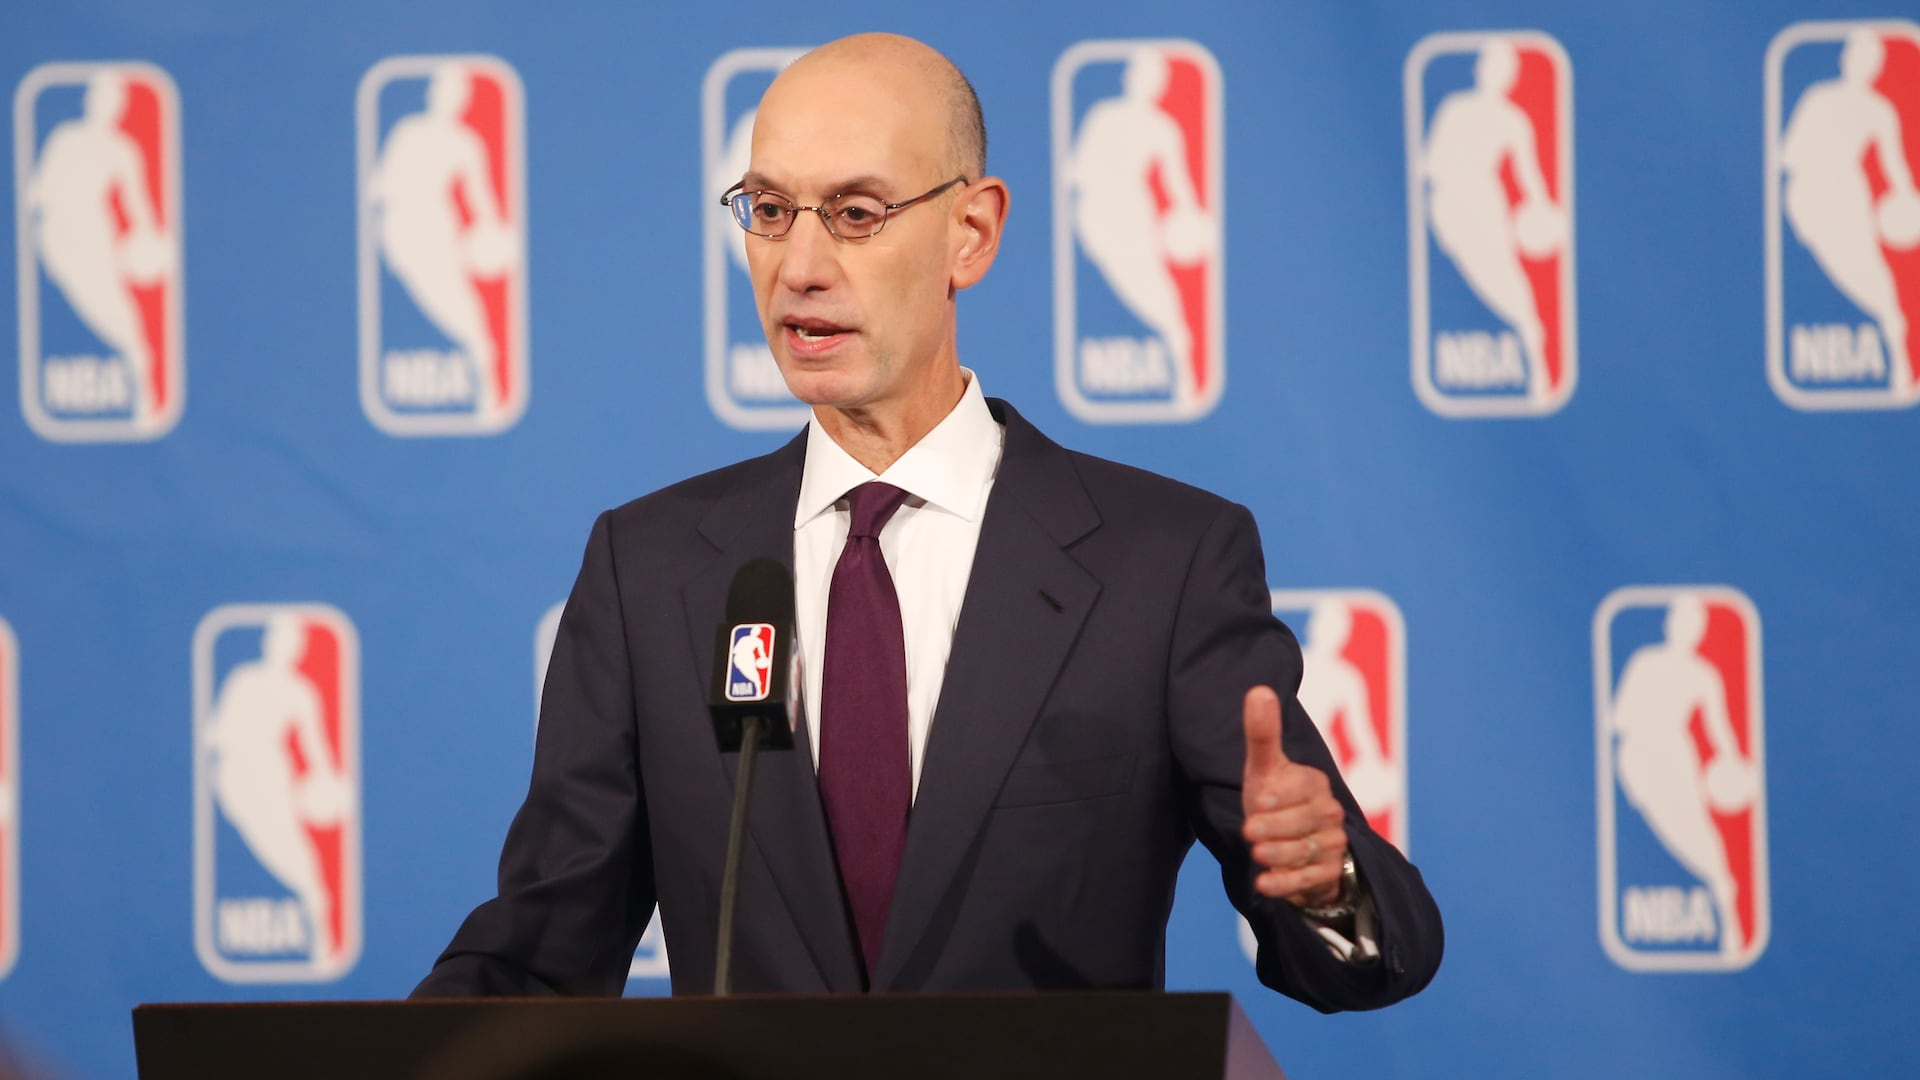 NBA has 'exploratory' talks with Disney about resuming season